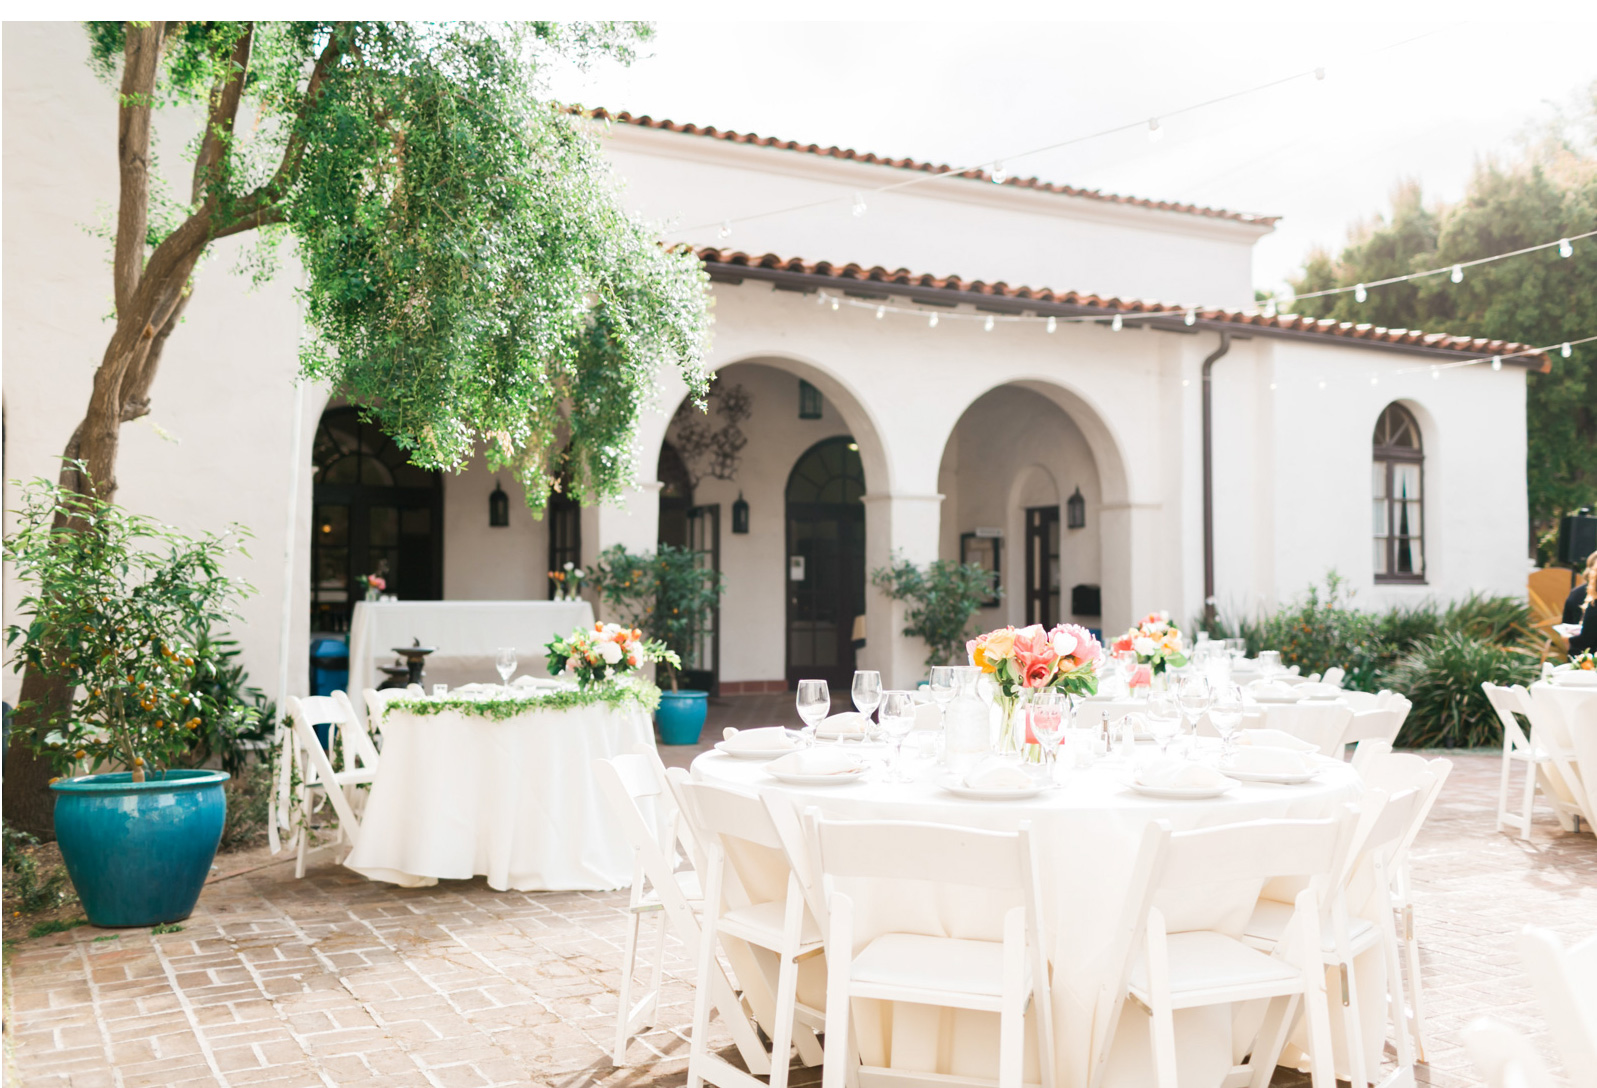 Southern-California-Santa-Barbara-Wedding-Photographer-Natalie-Schutt-Photography_26.jpg